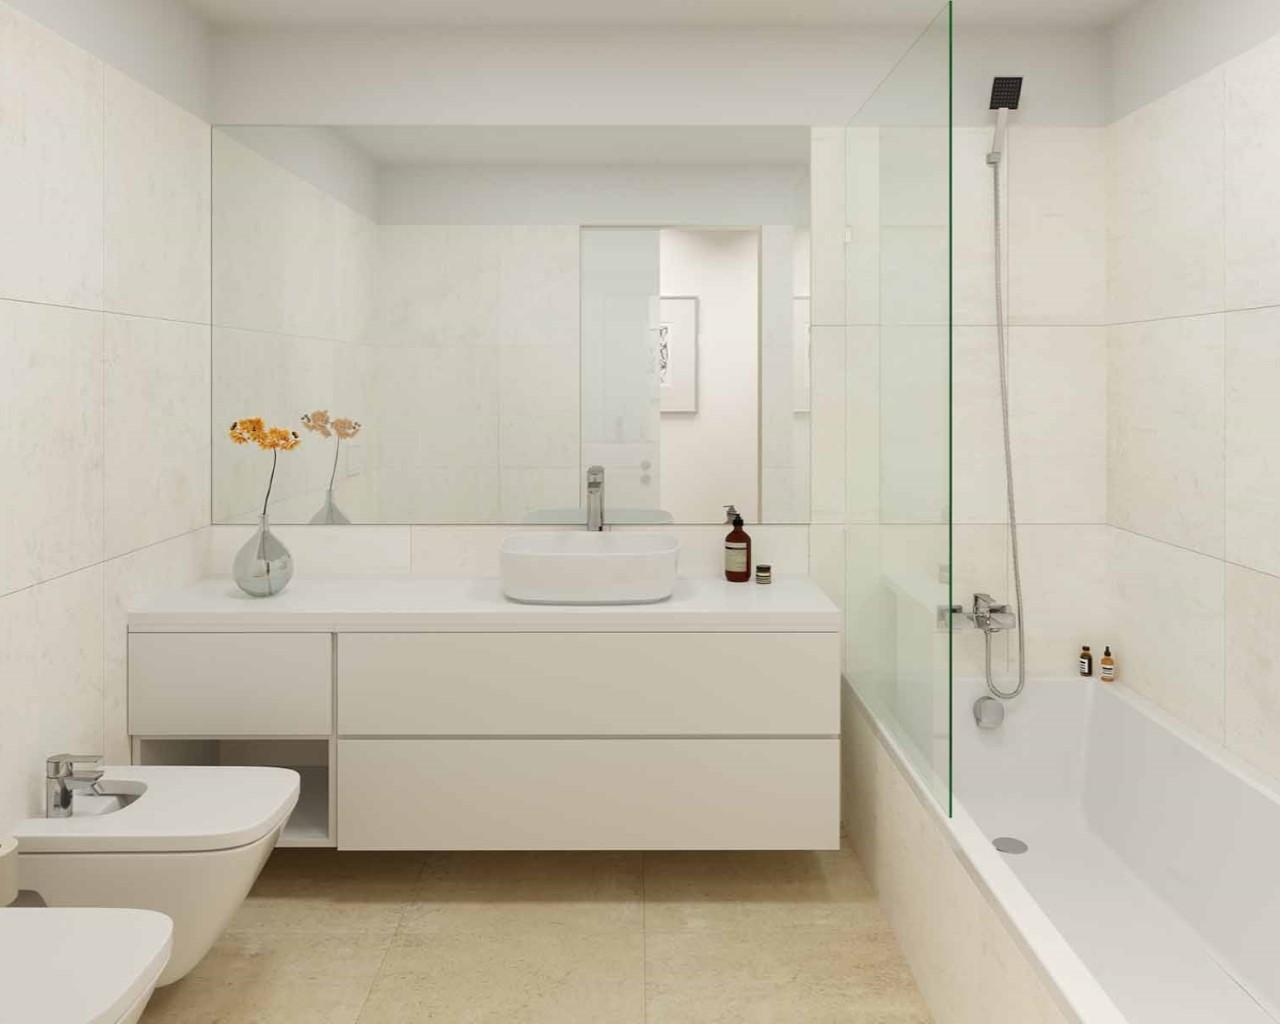 Lux Garden - Salle de bain - option plage